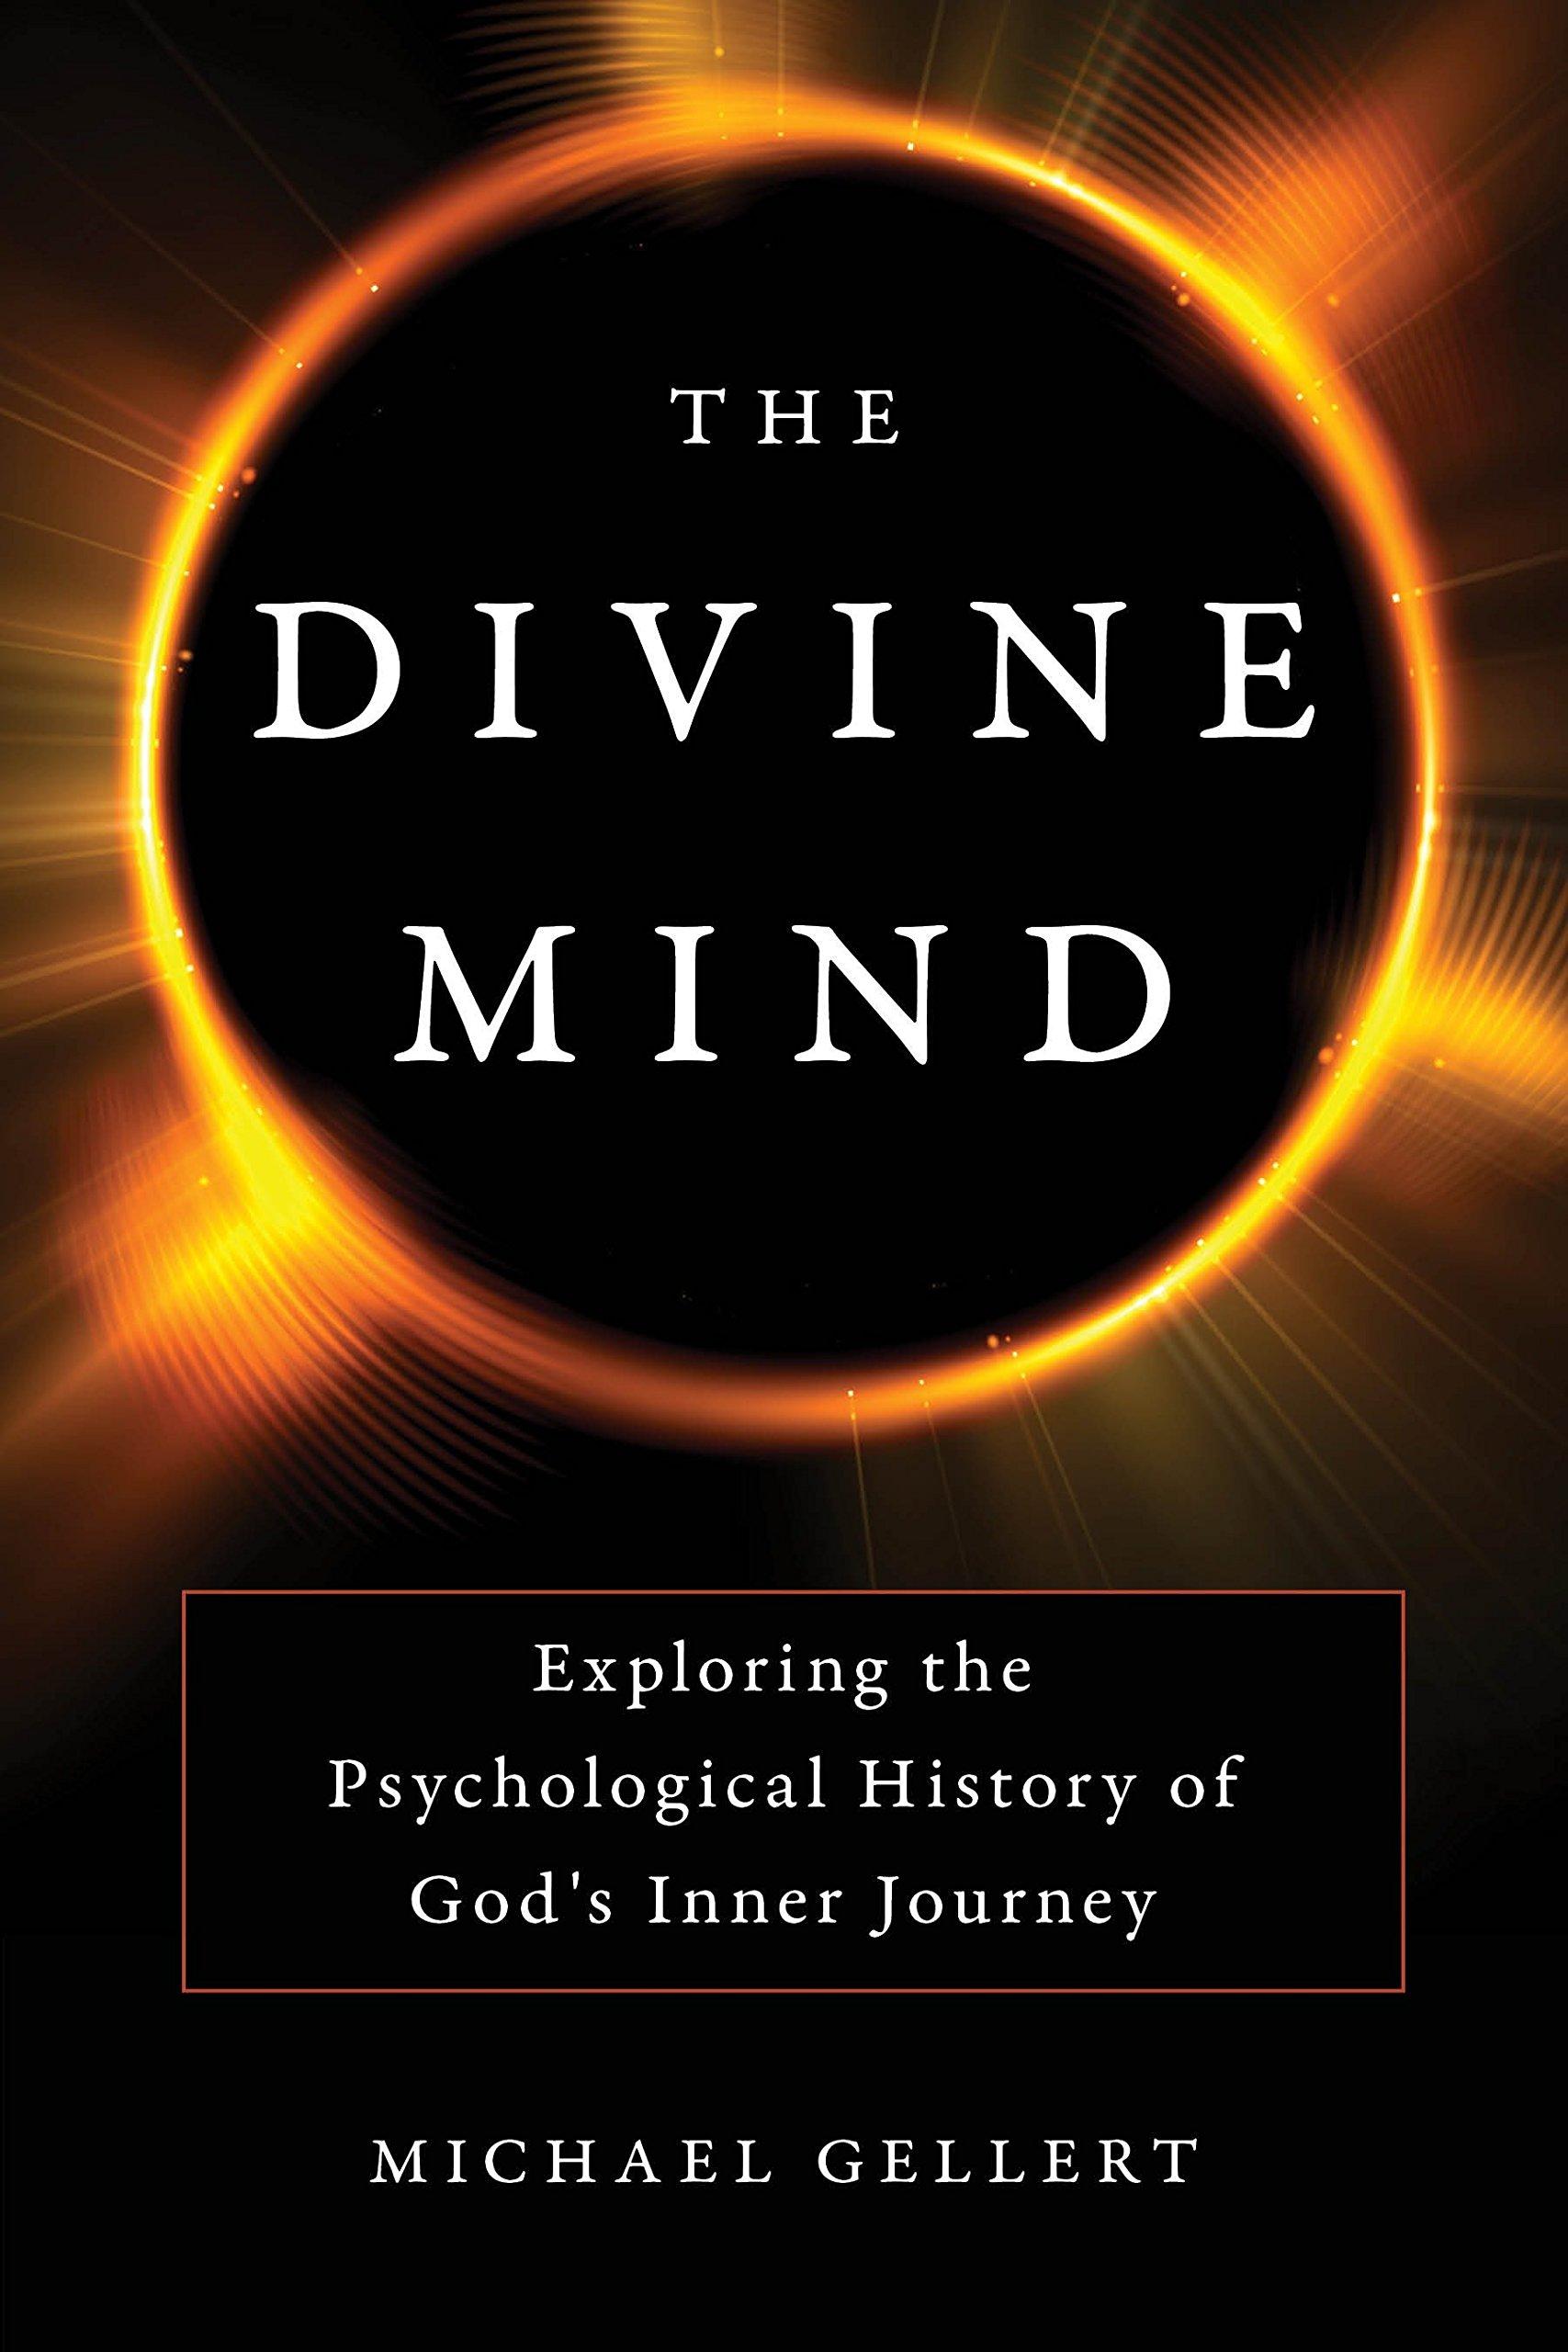 Download The Divine Mind: Exploring the Psychological History of God's Inner Journey pdf